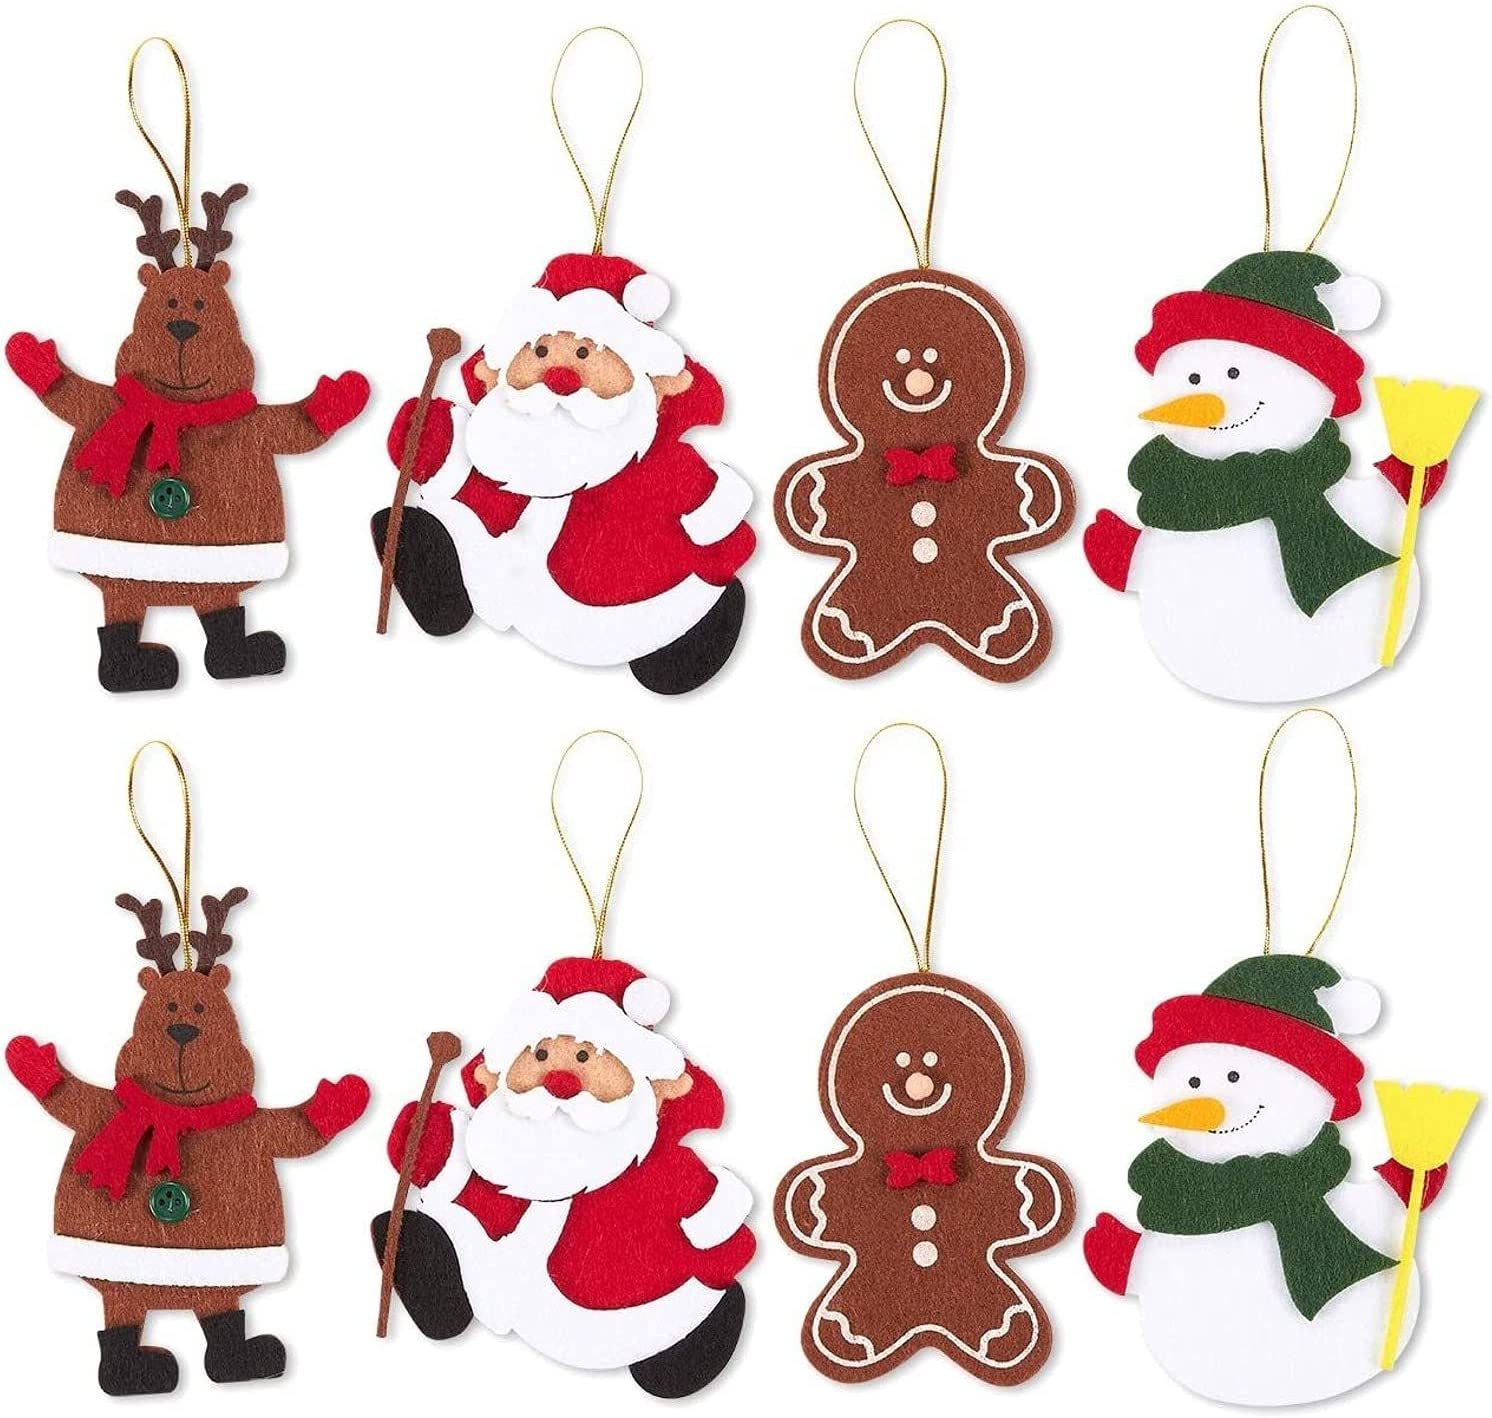 Felt Christmas Ornaments, Reindeer, Santa Claus, Gingerbread Man, Snowman (8 Pack)